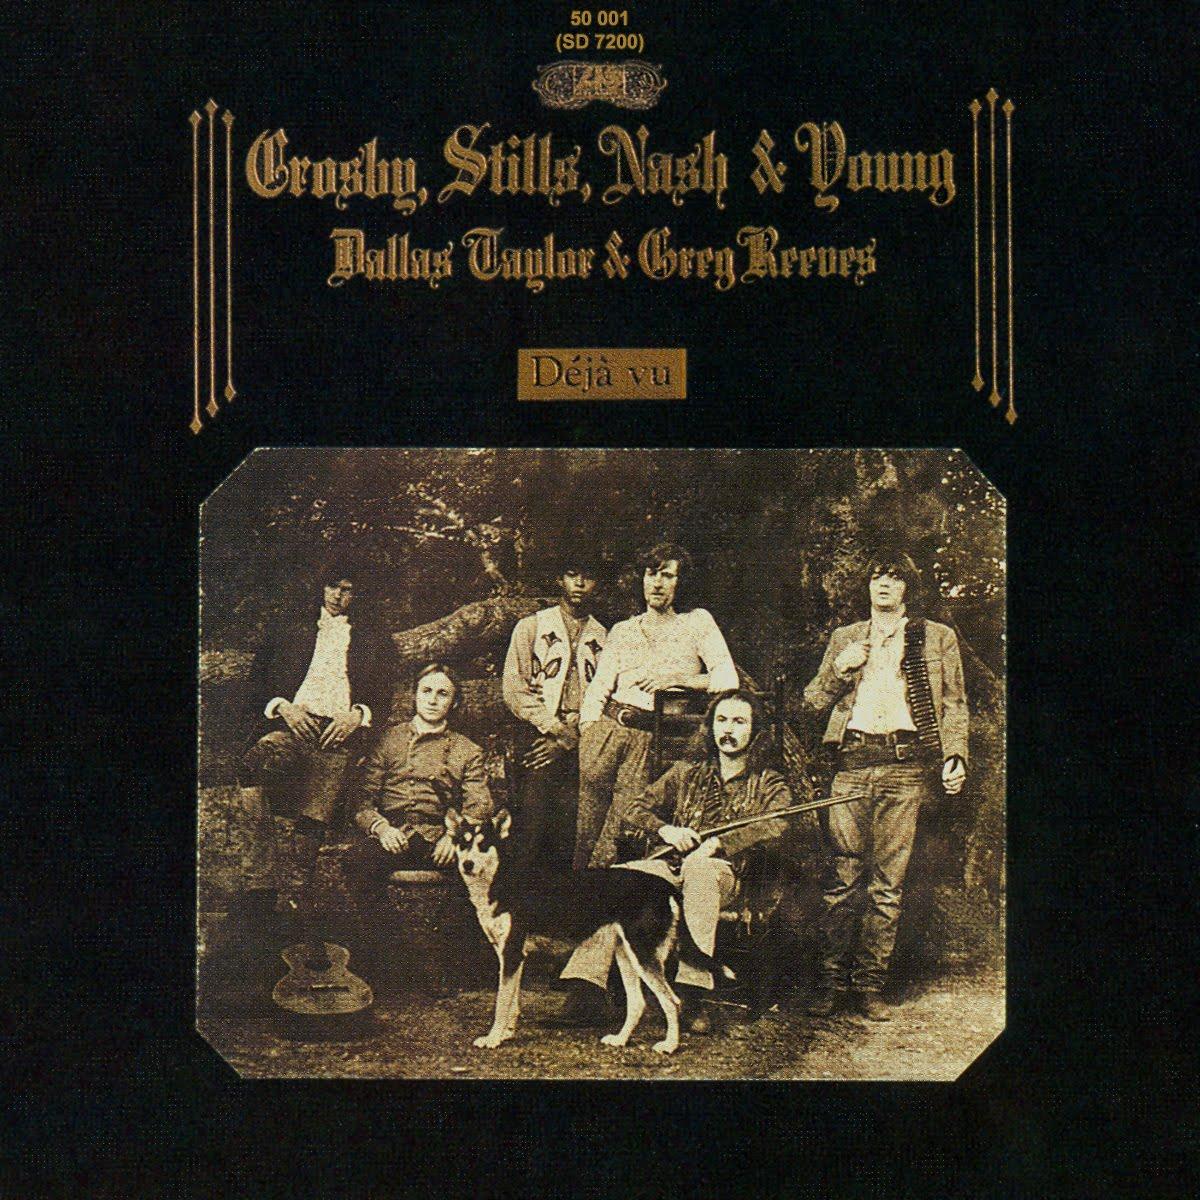 zappadalata: CROSBY STILLS NASH & YOUNG 1970 Déjà Vu